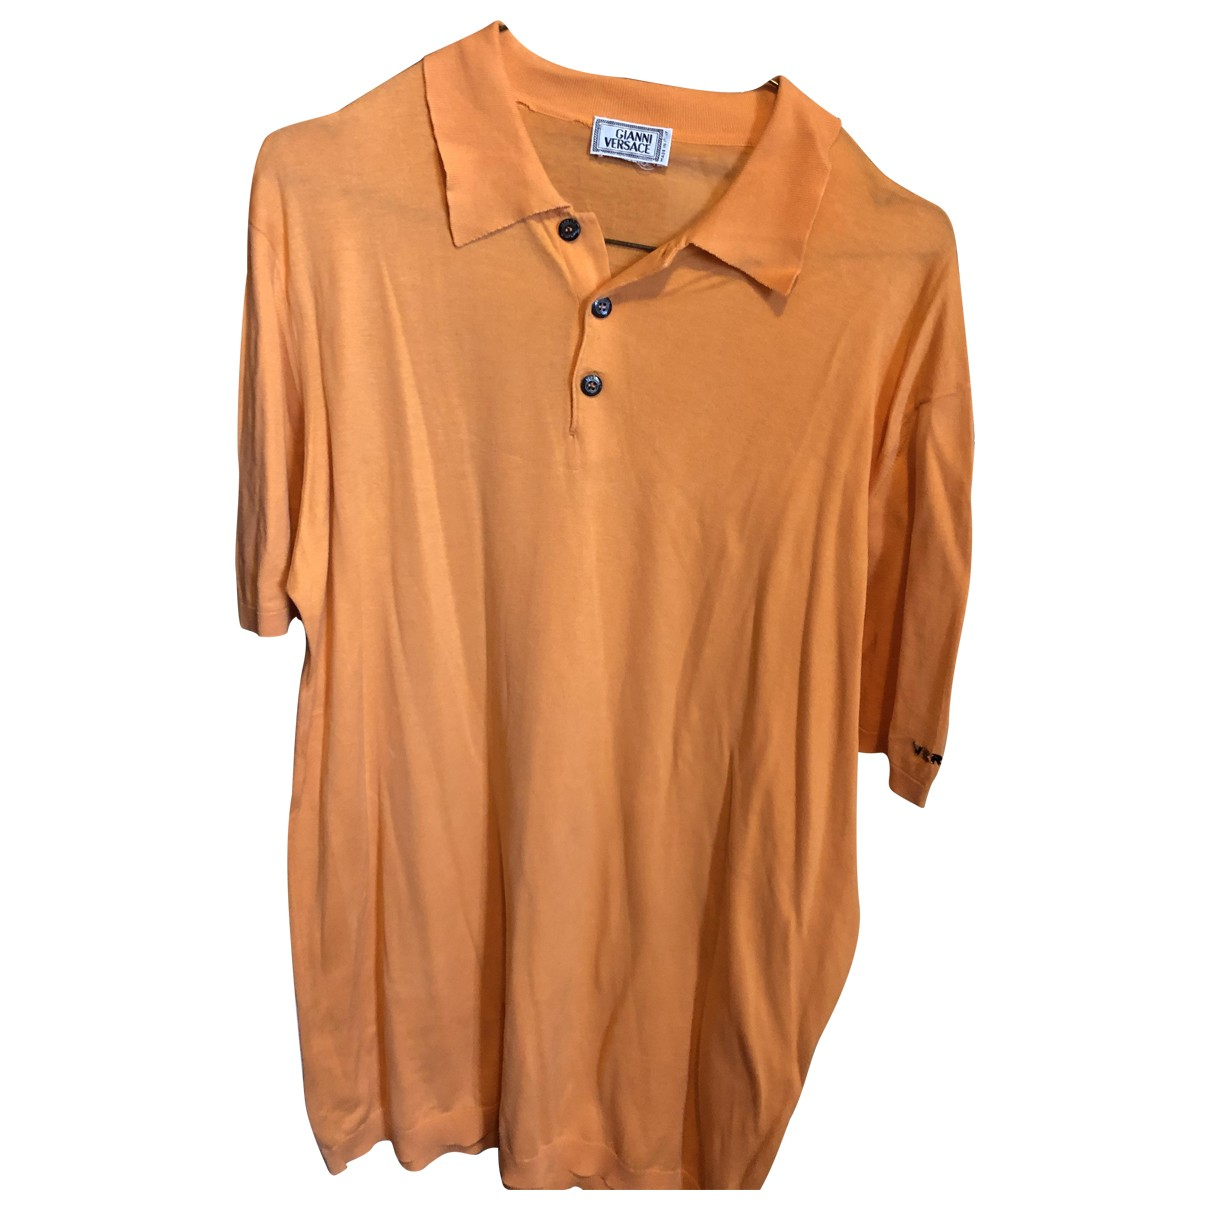 Polo en Algodon Naranja Gianni Versace